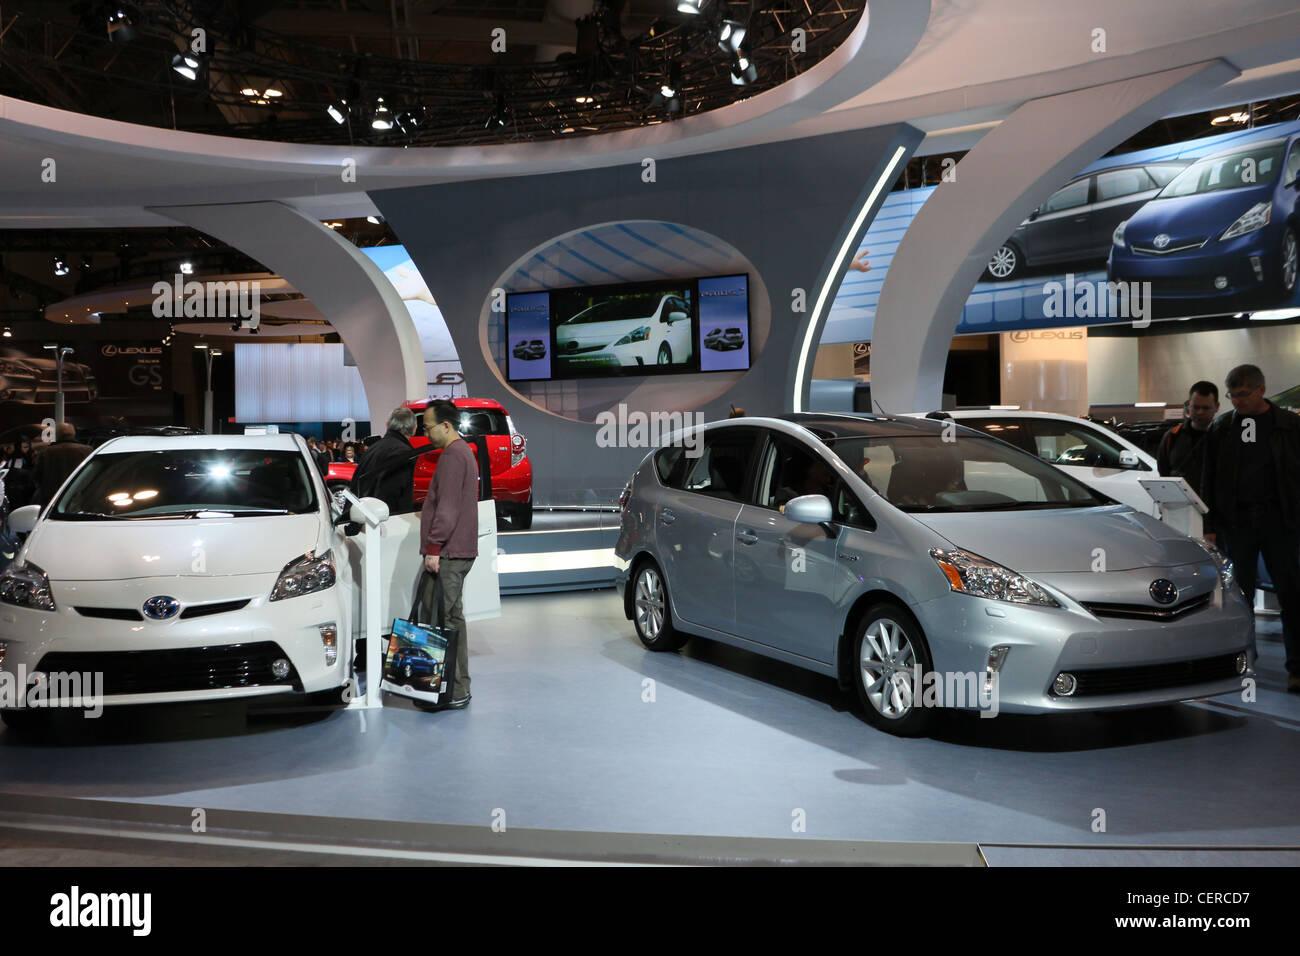 toyota prius electric hybrid car cars showroom - Stock Image